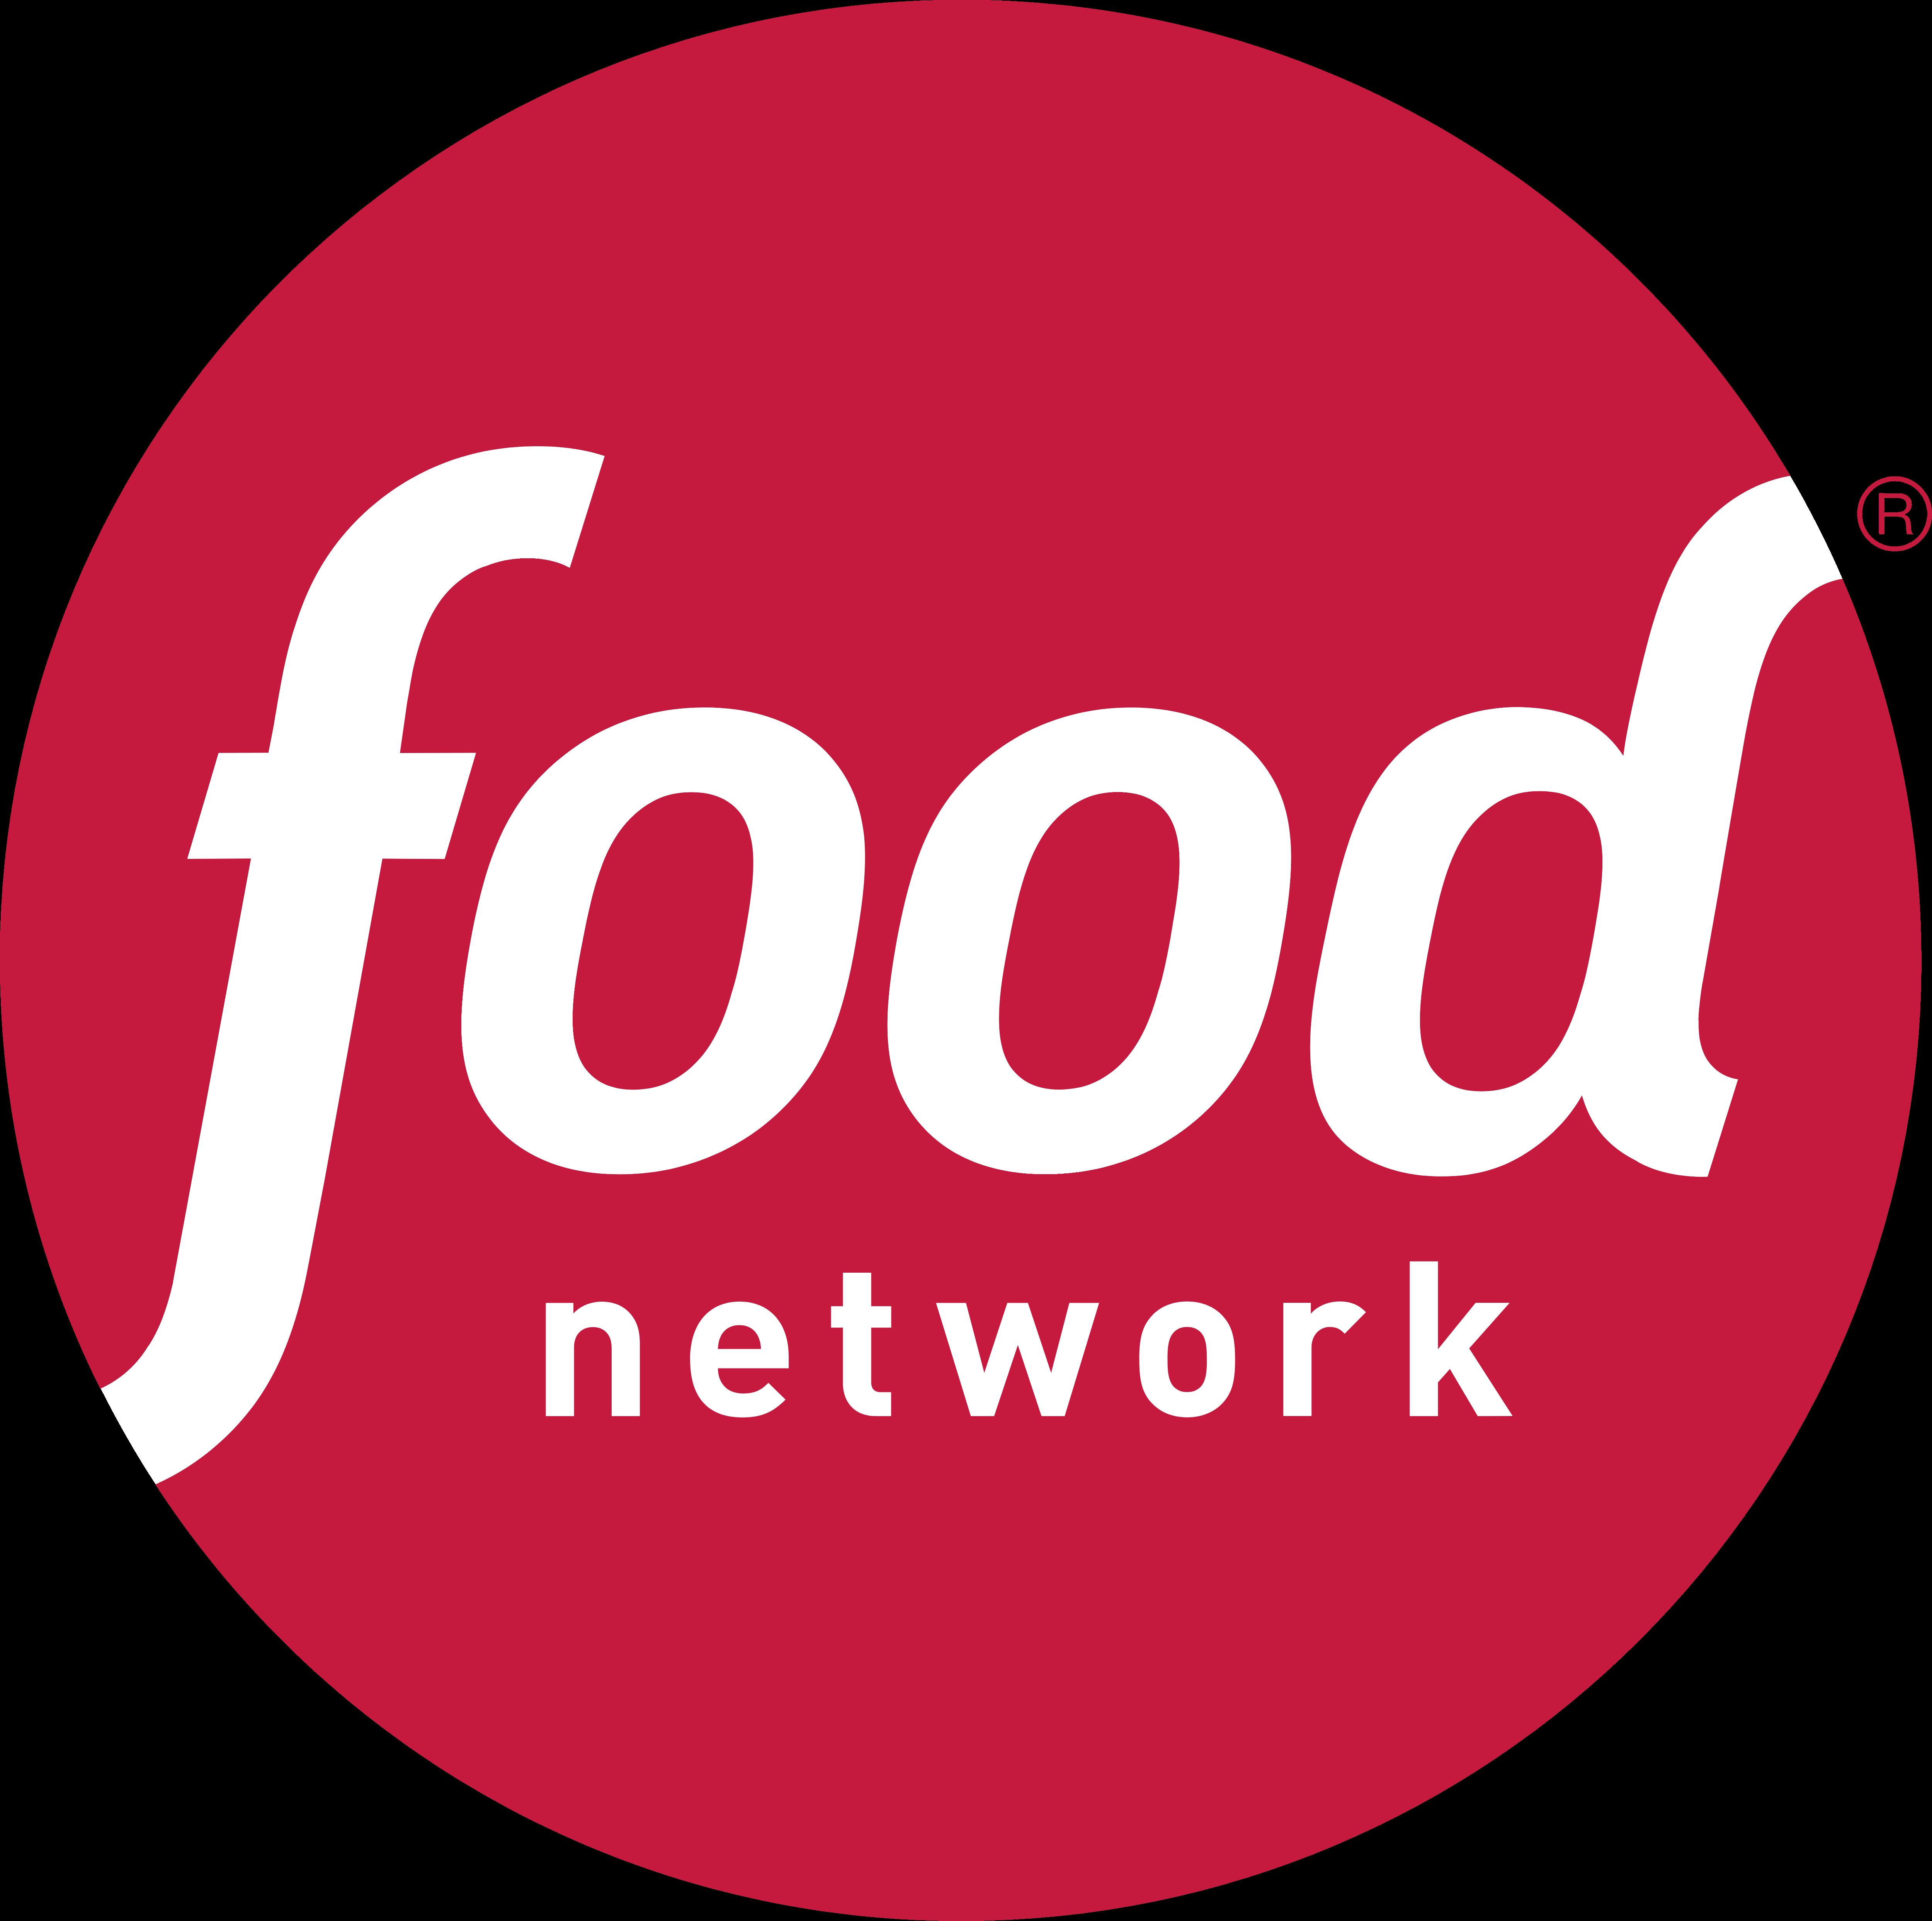 food network logos download